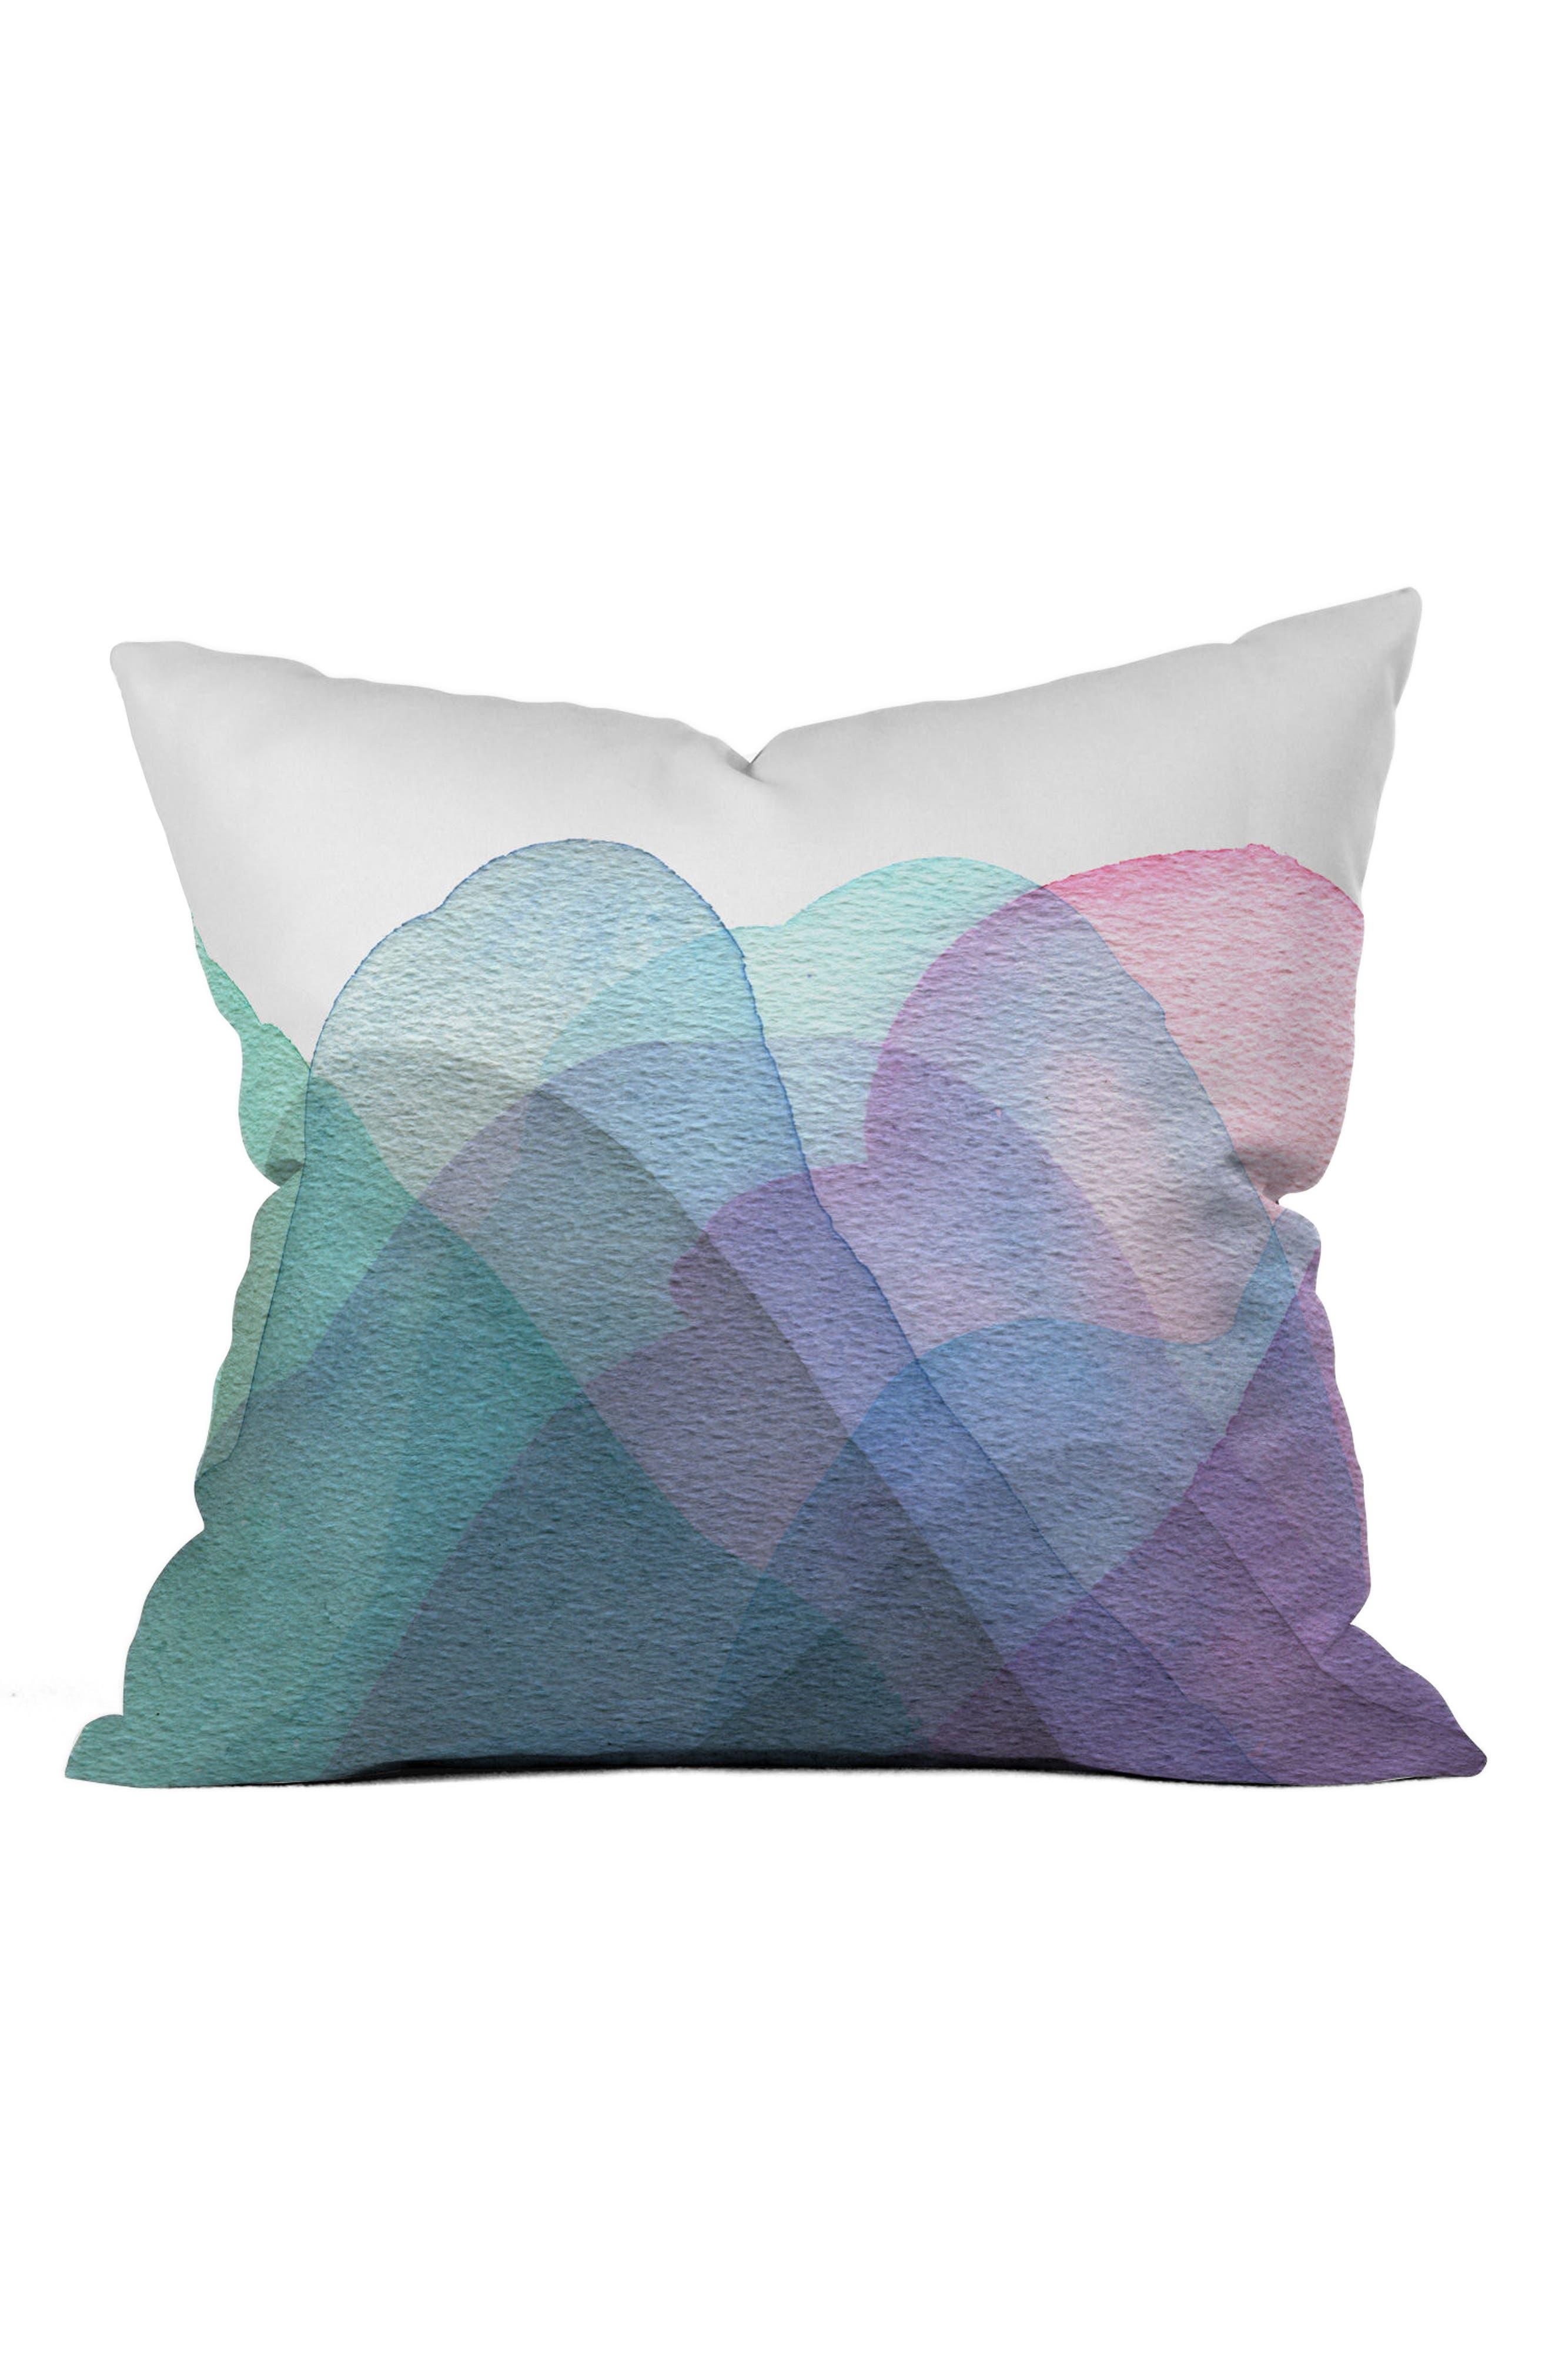 Main Image - Deny Designs Layers Pillow